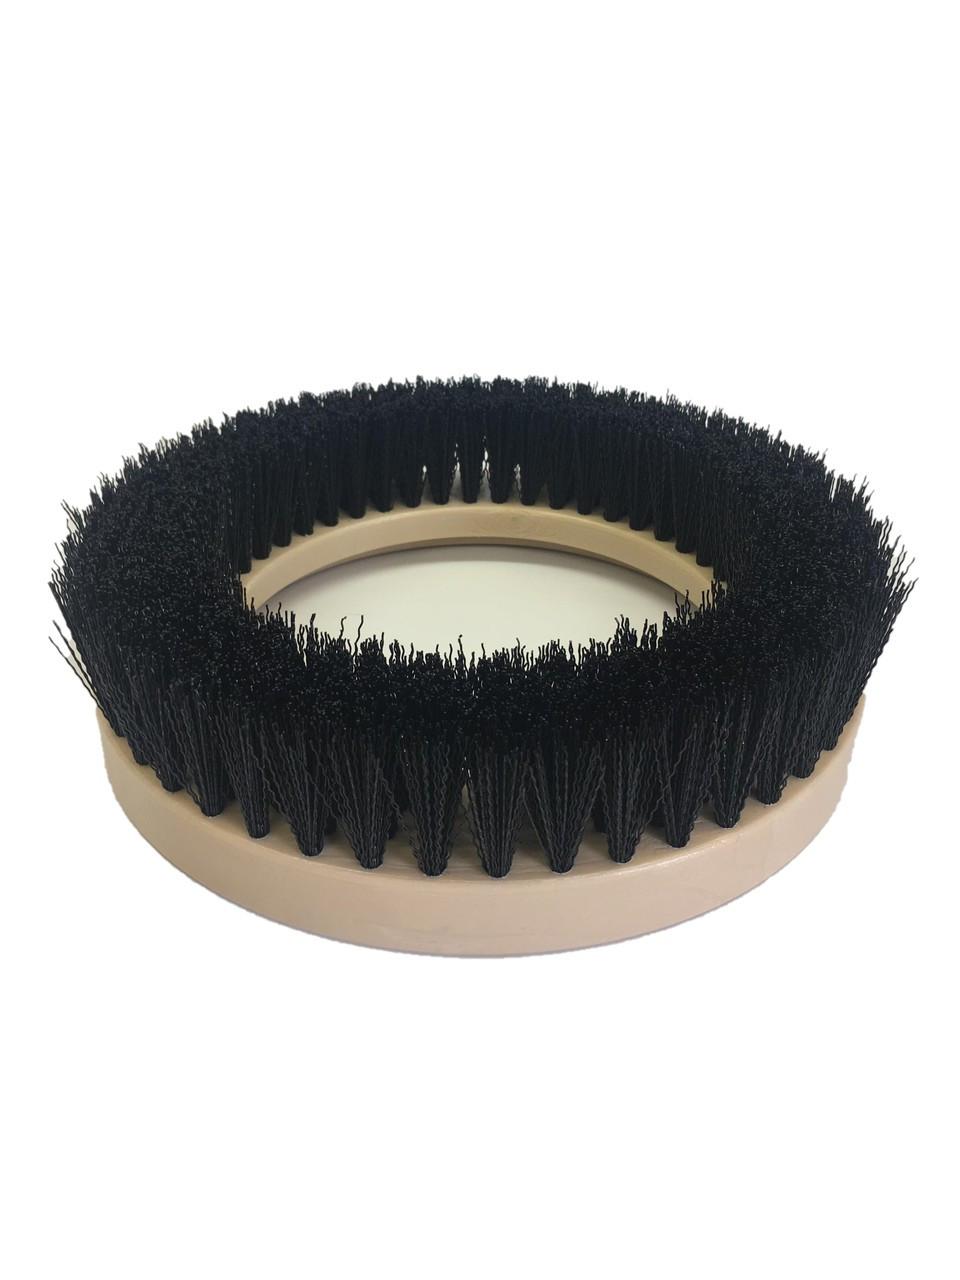 "9"" Flat Medium Brush, 1.5"" bristle, Nylon, #2 brush alone"